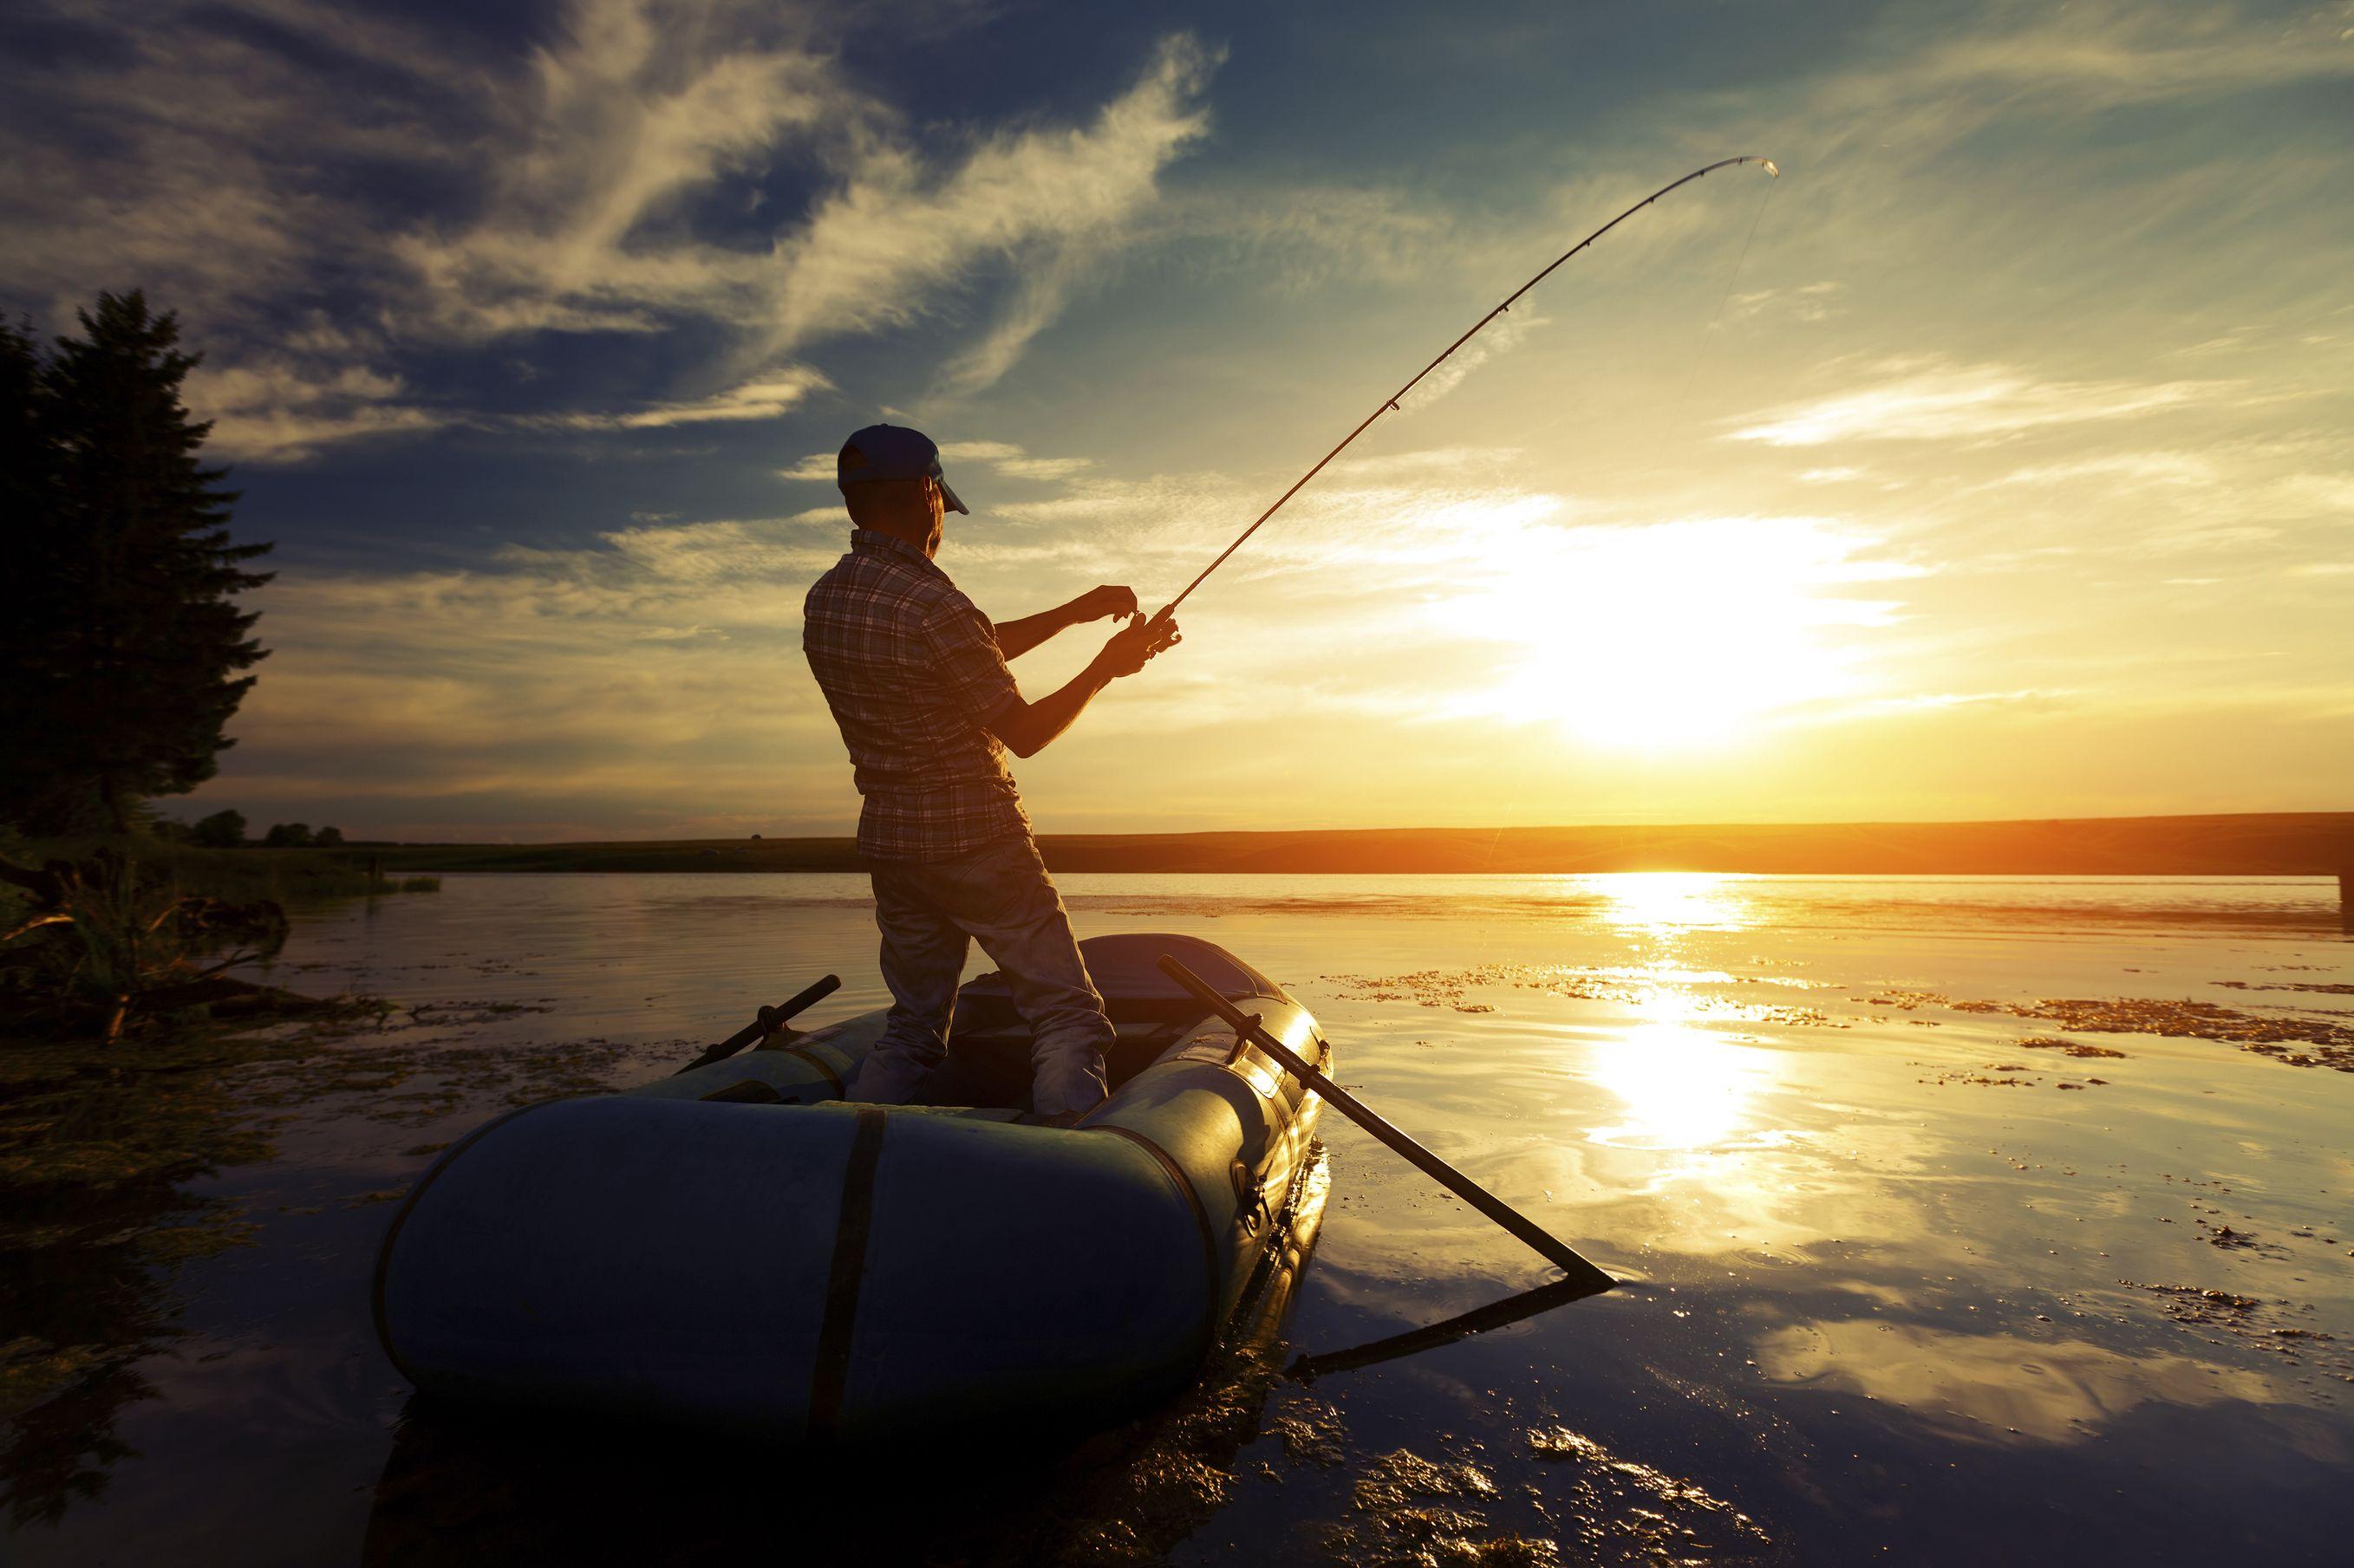 On the lake going fishing Going fishing, Ge image